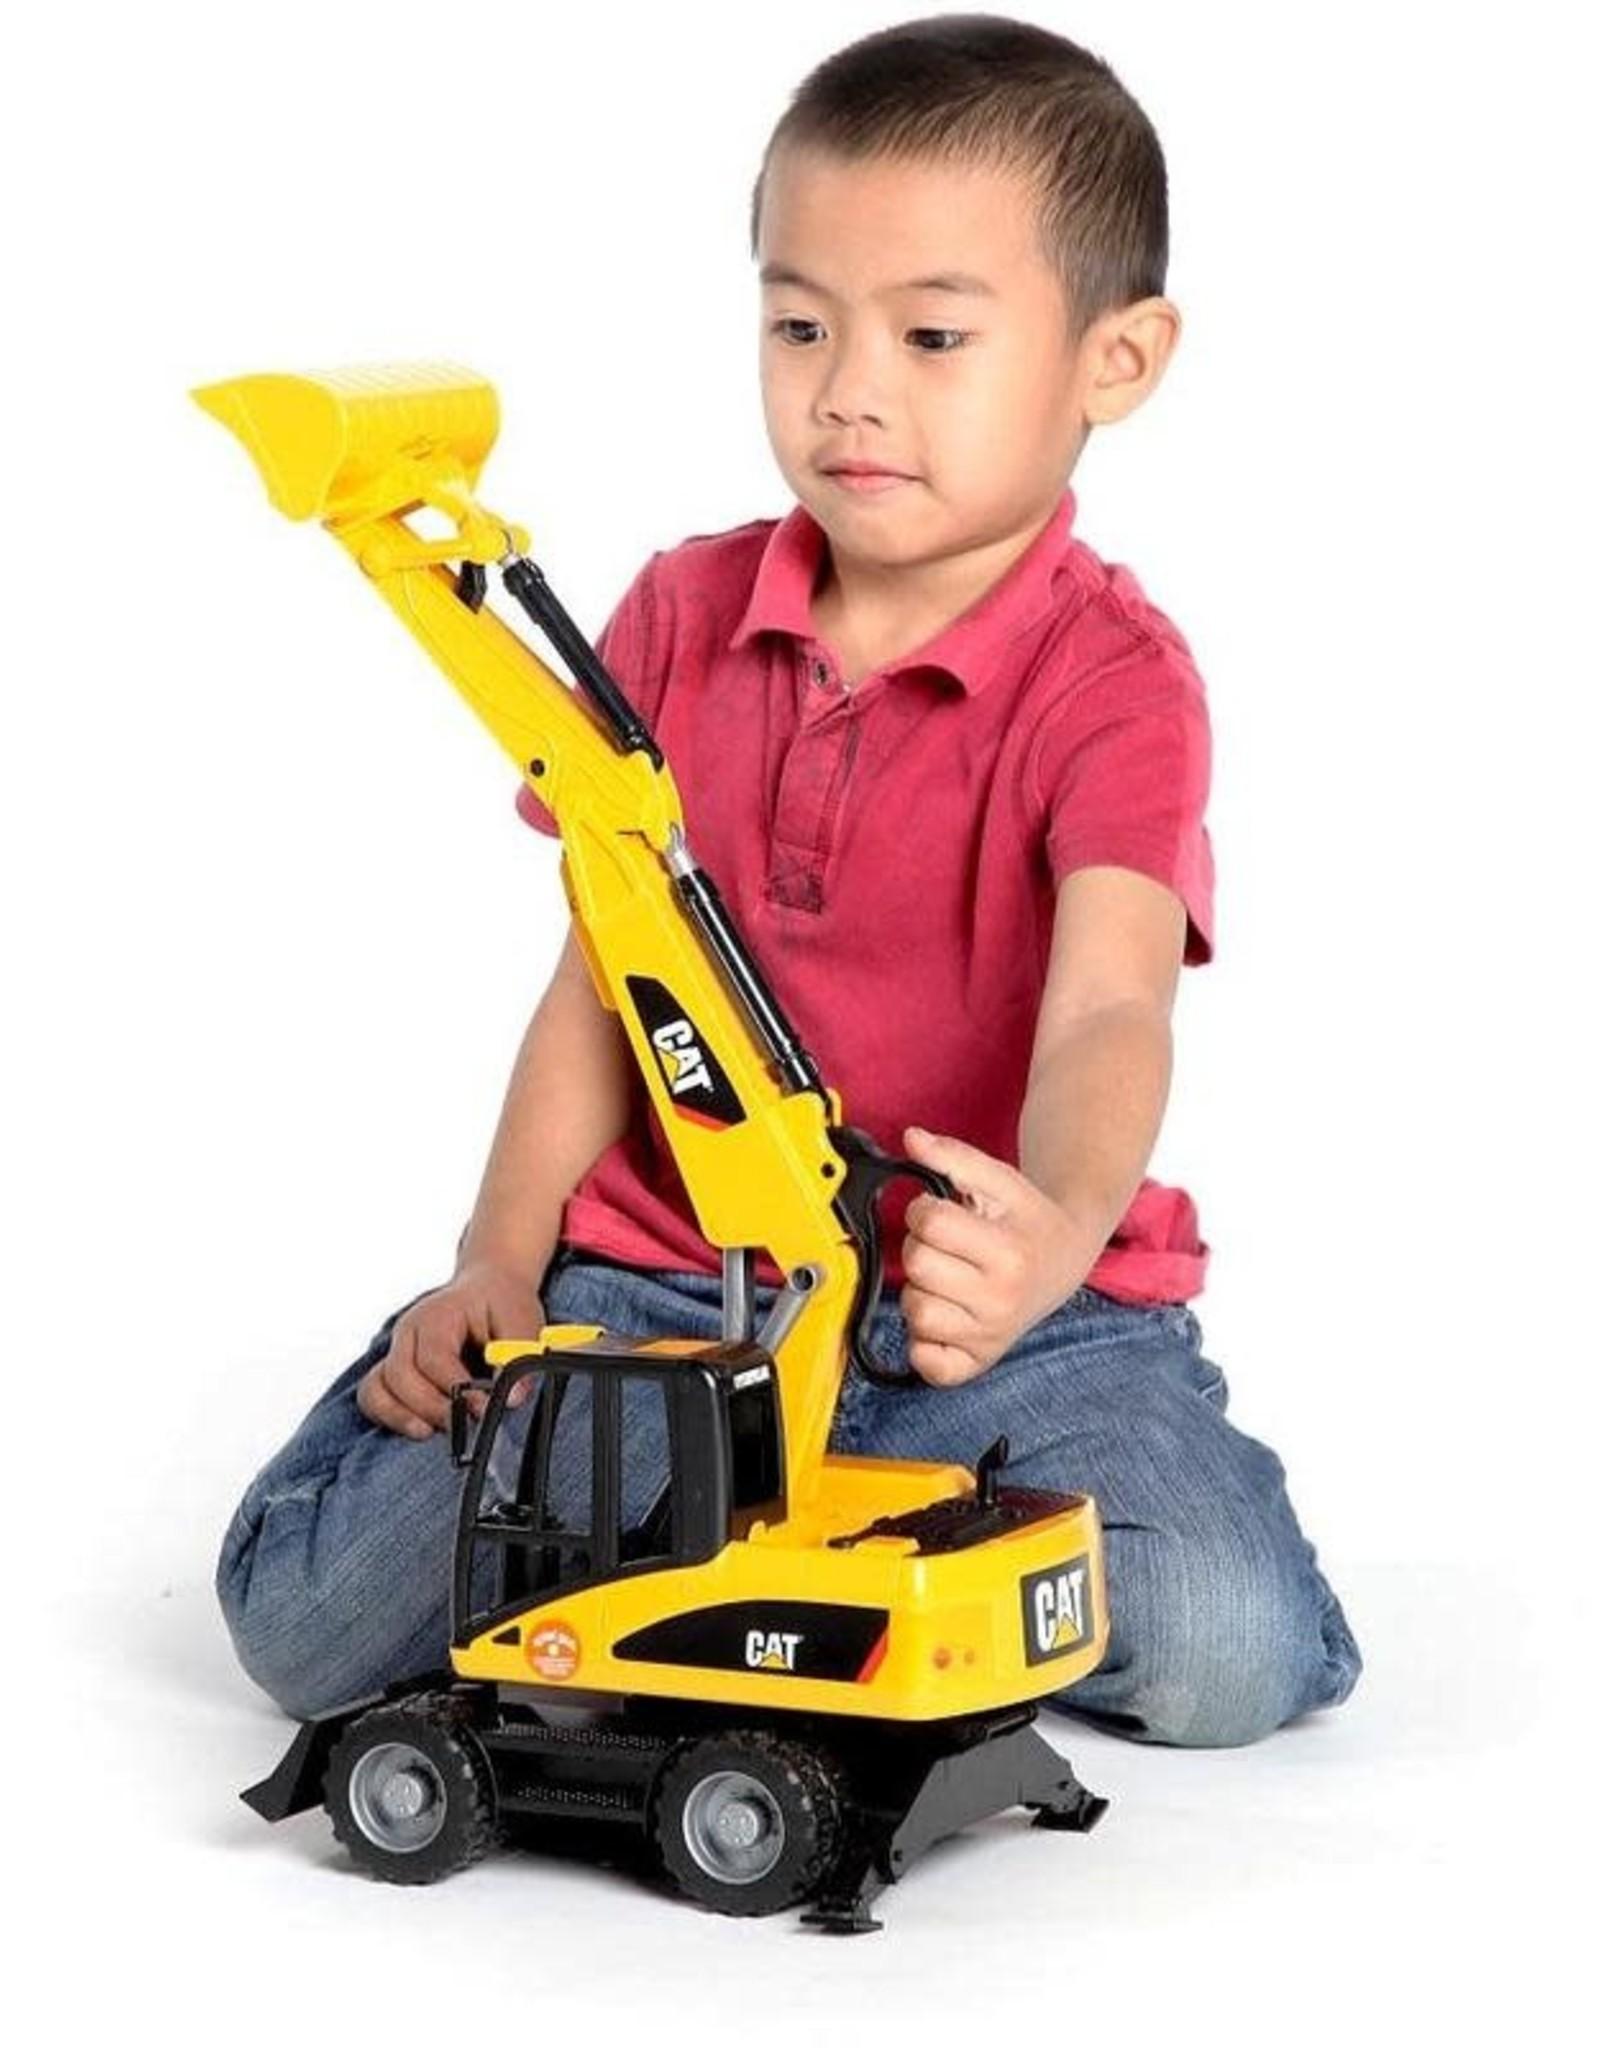 Caterpillar Small Wheel Excavator